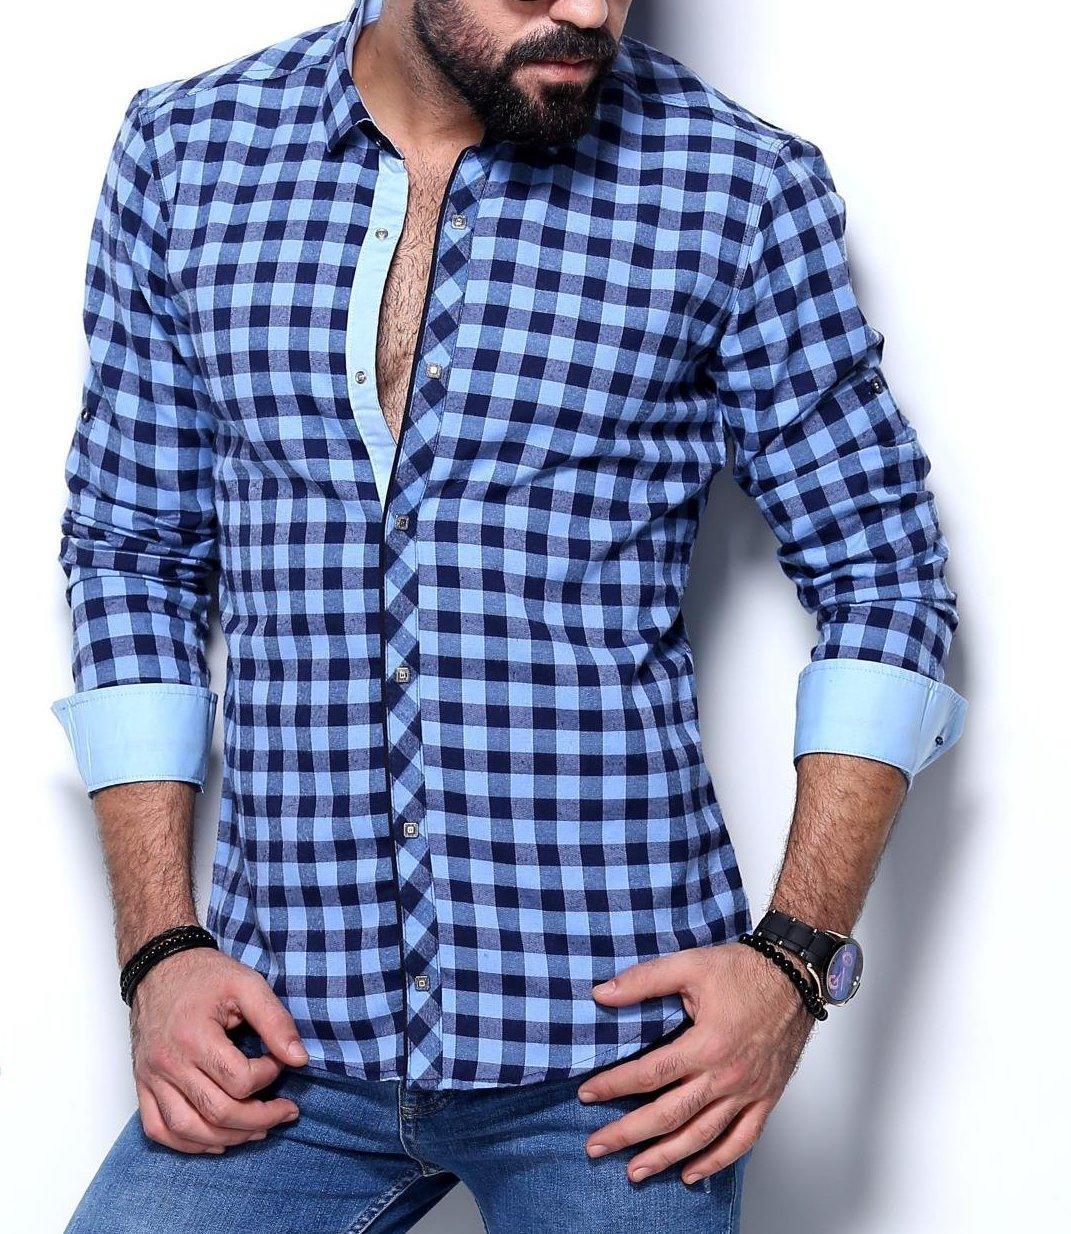 Рубашка на байке для мужчин в мелкую клетку, фото 1